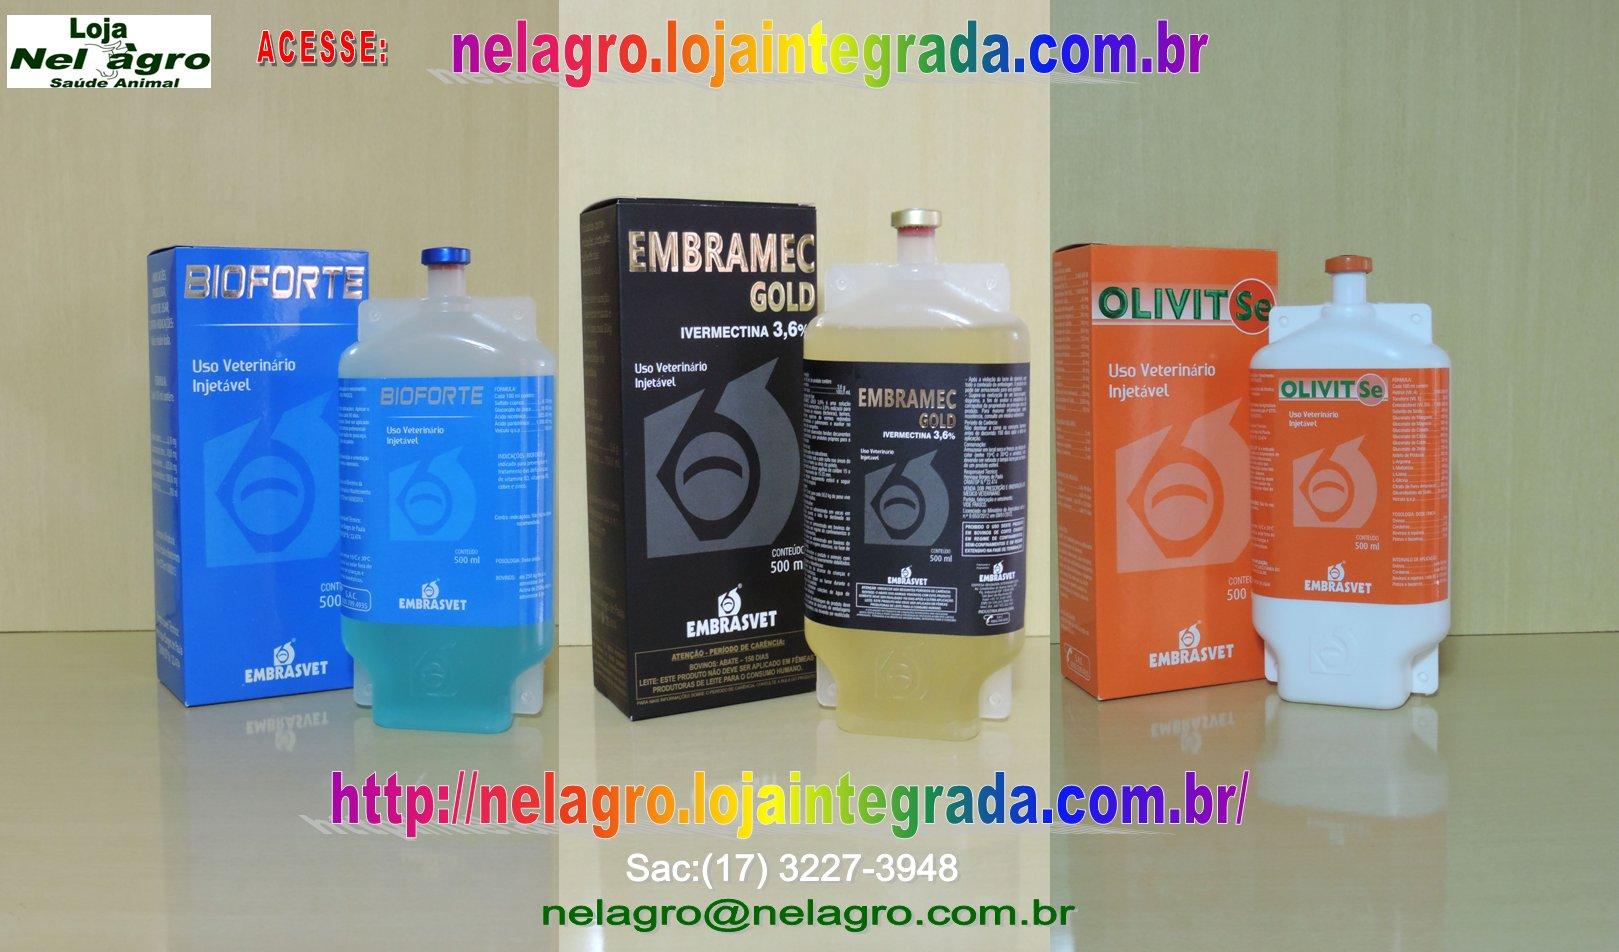 EMBRAMEC GOLD+BIOFORTE